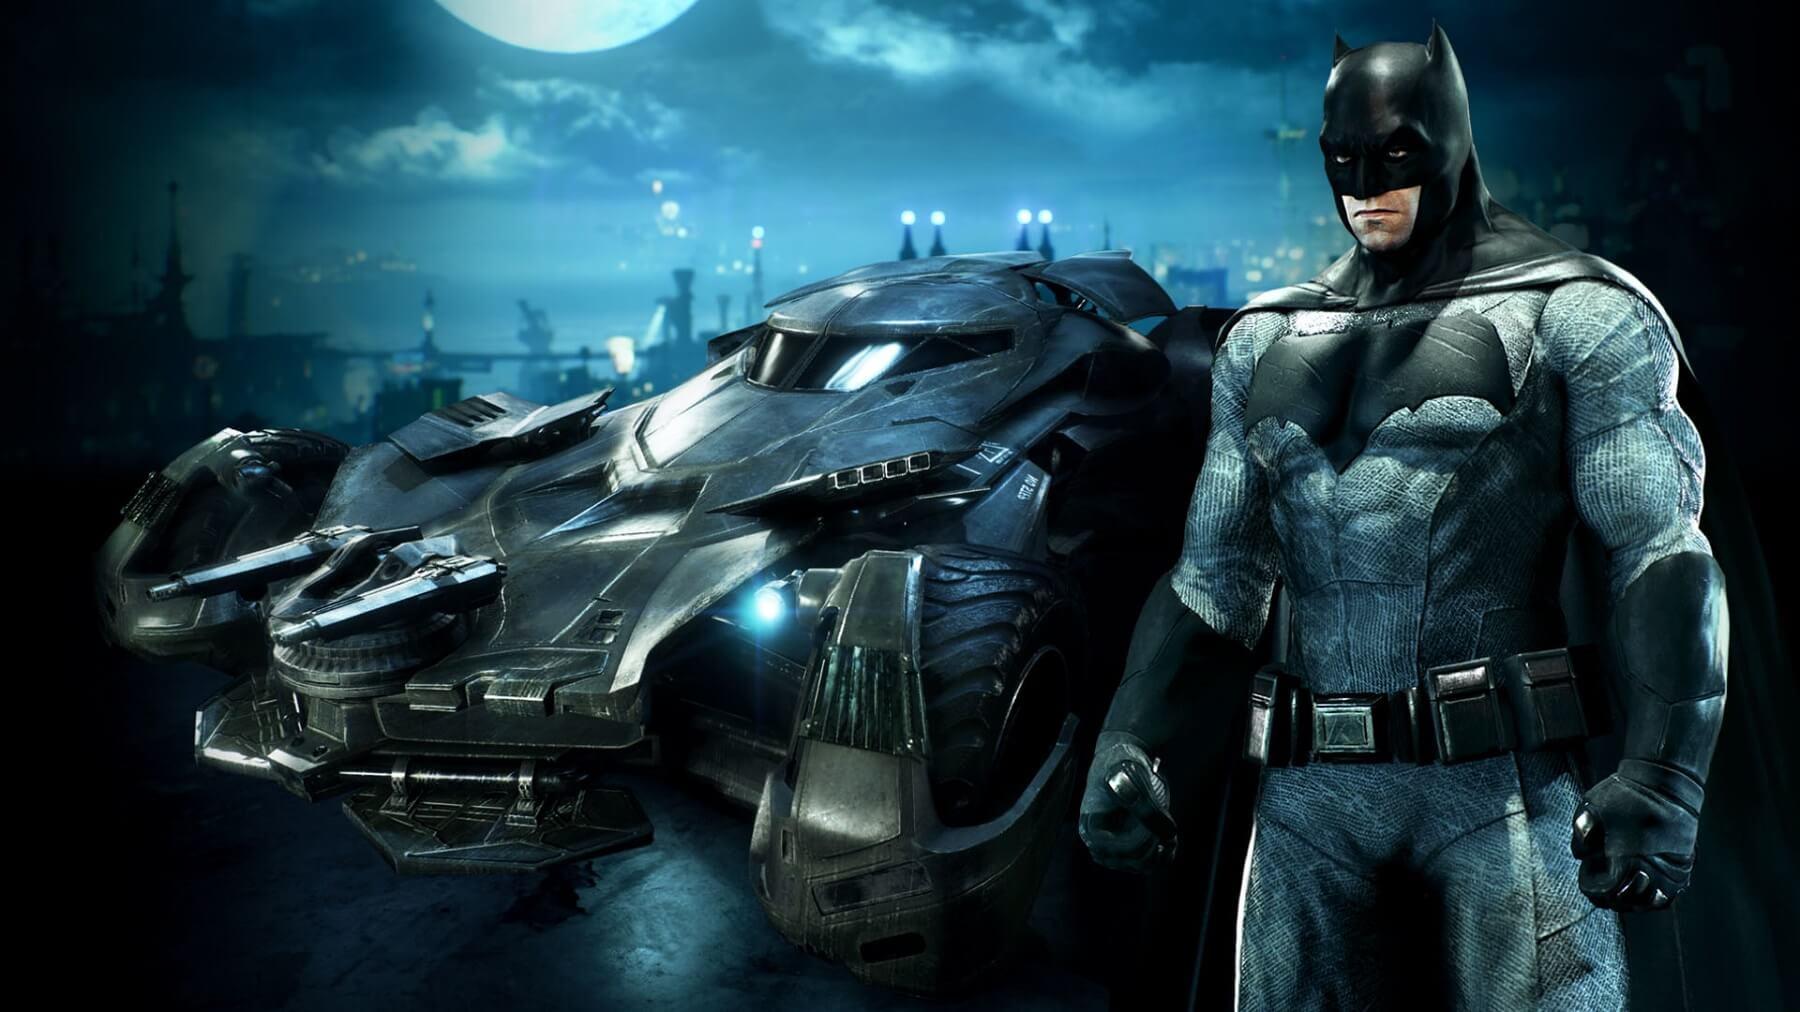 Batman - BVS skin